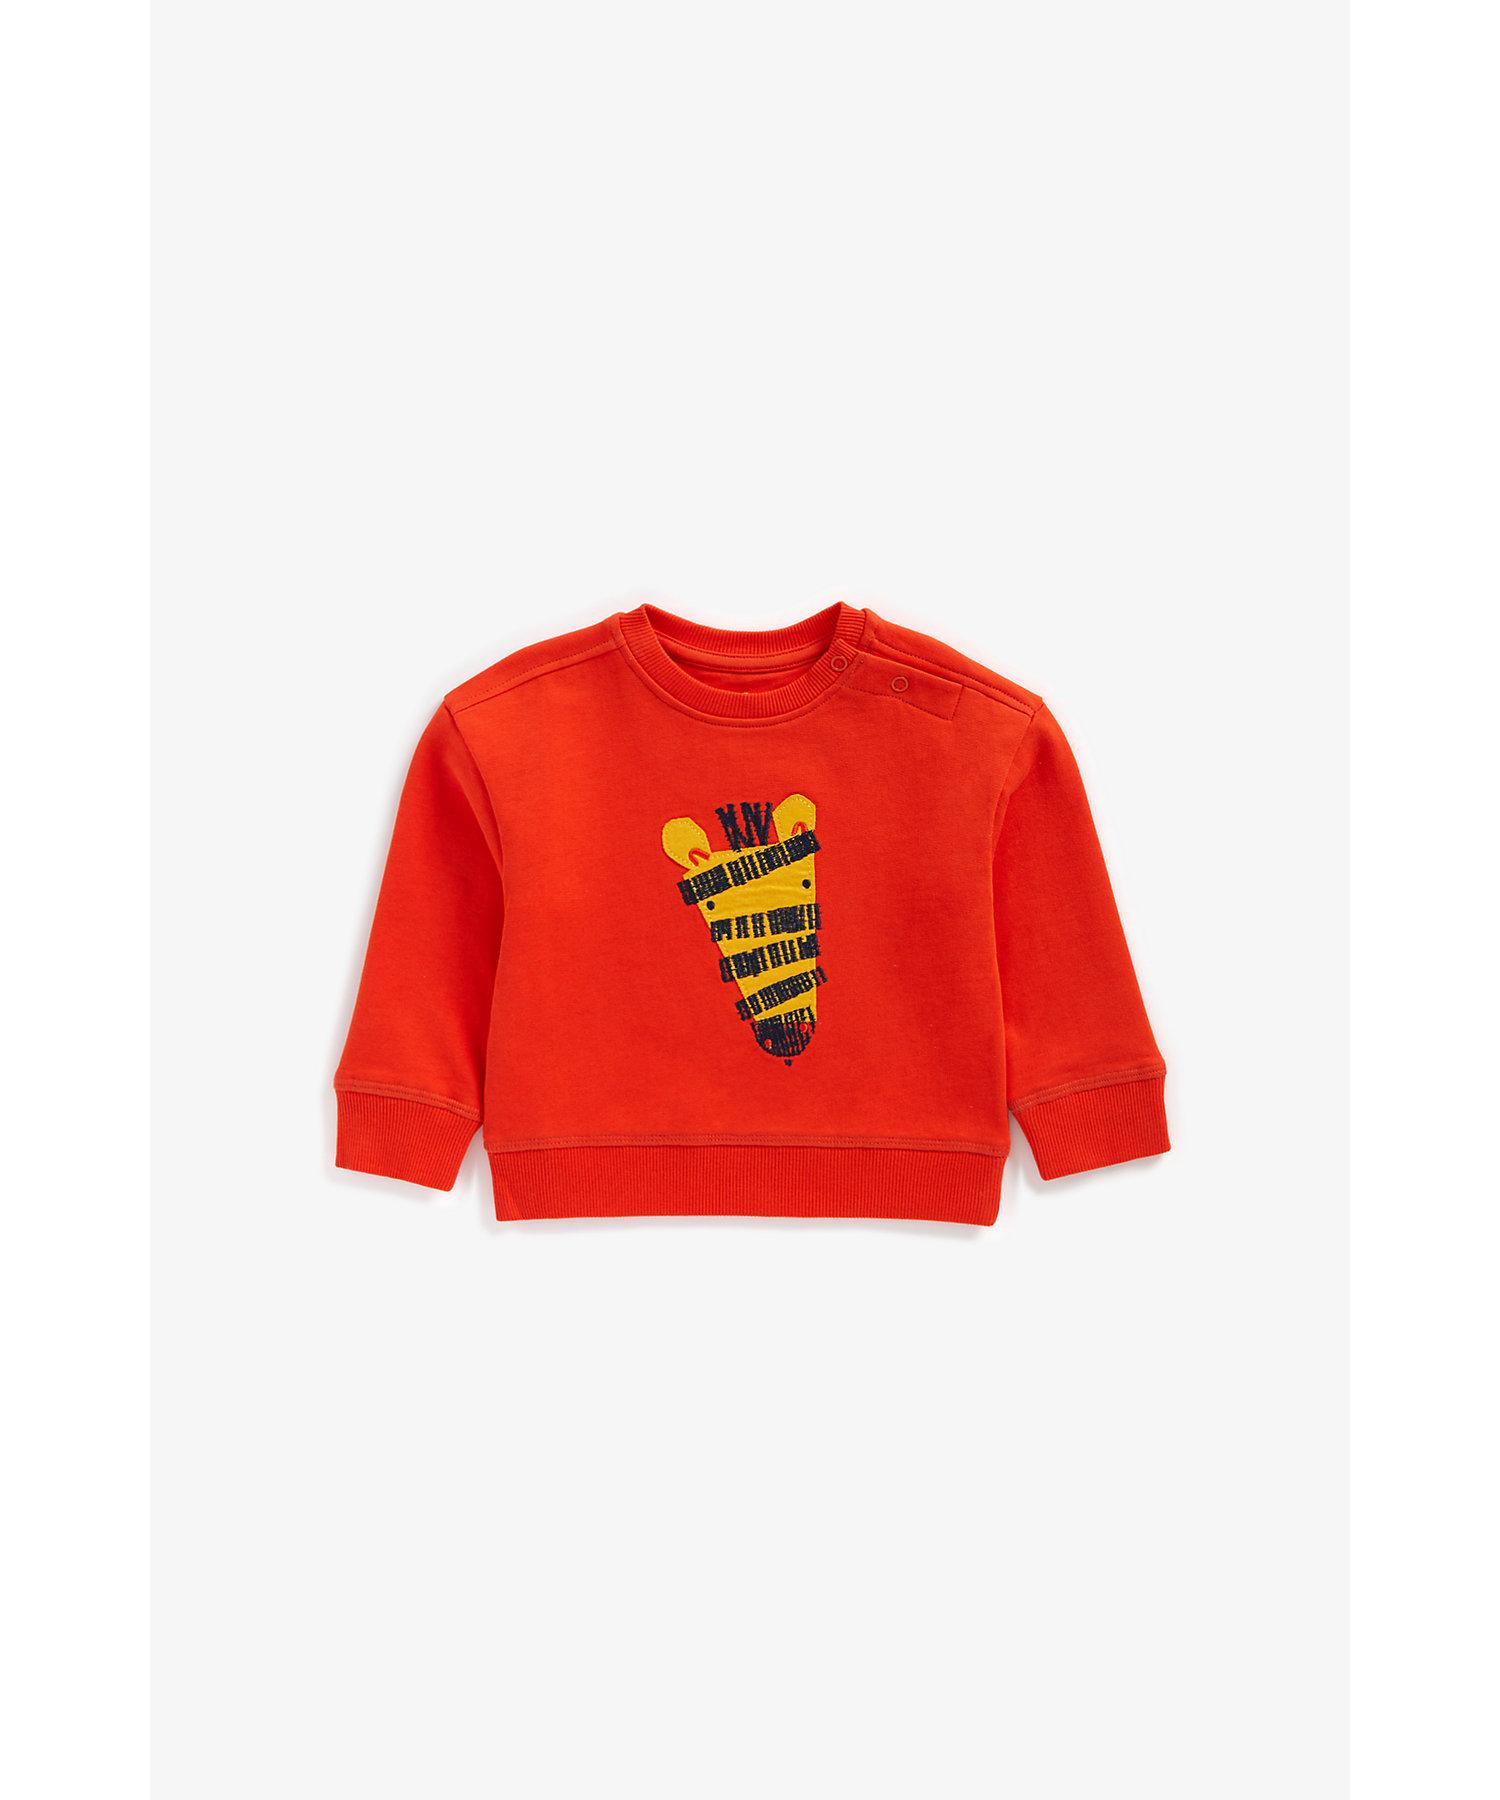 Mothercare | Boys Full Sleeves Sweatshirt Zebra Patchwork - Red